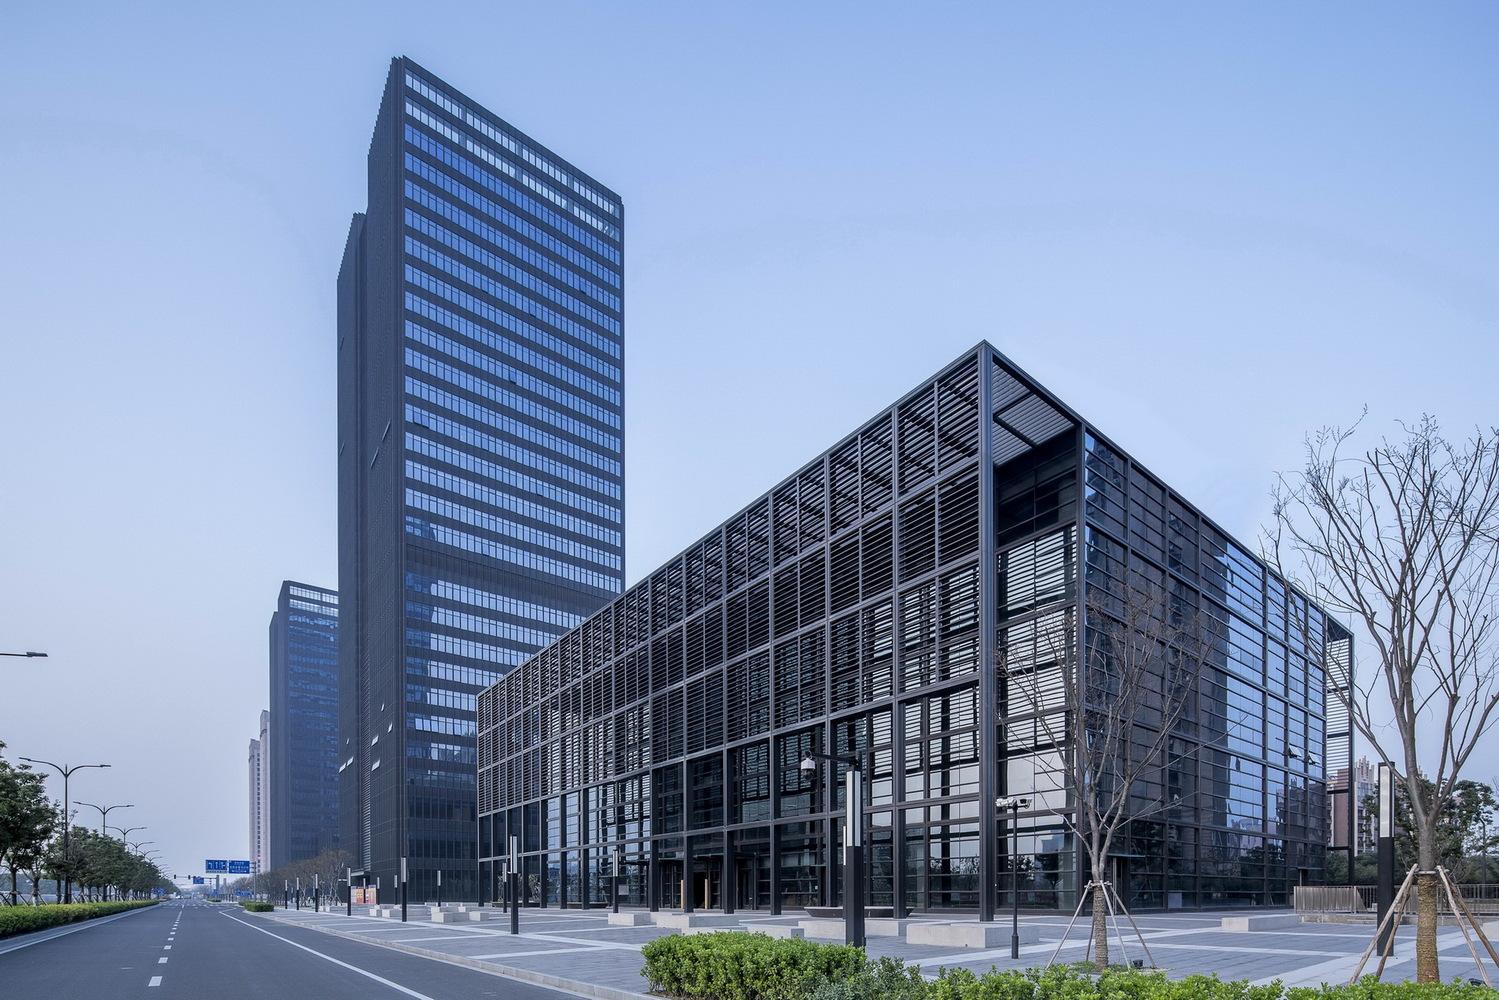 Kunshan Sports Center: Kunshan Financial Street Phase I Complex / FTA Group GmbH